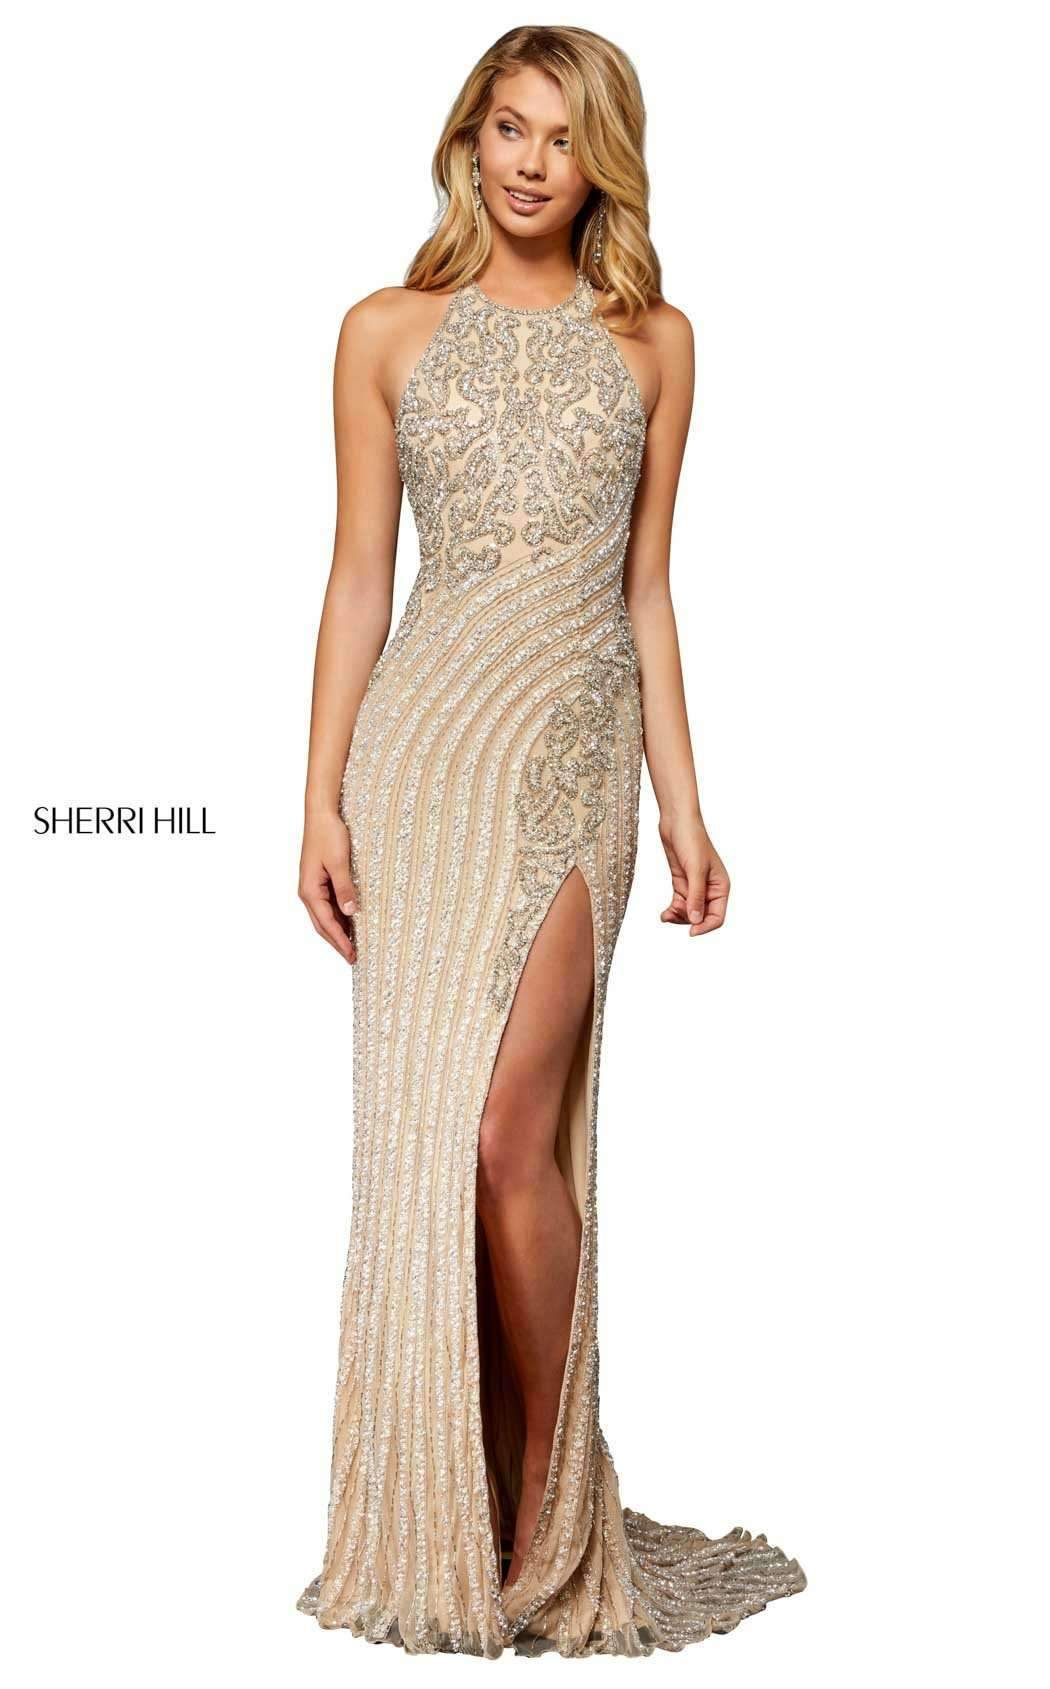 3ab723d4 Sherri Hill 52368 | Products | Prom dresses, Dresses, Sherri hill